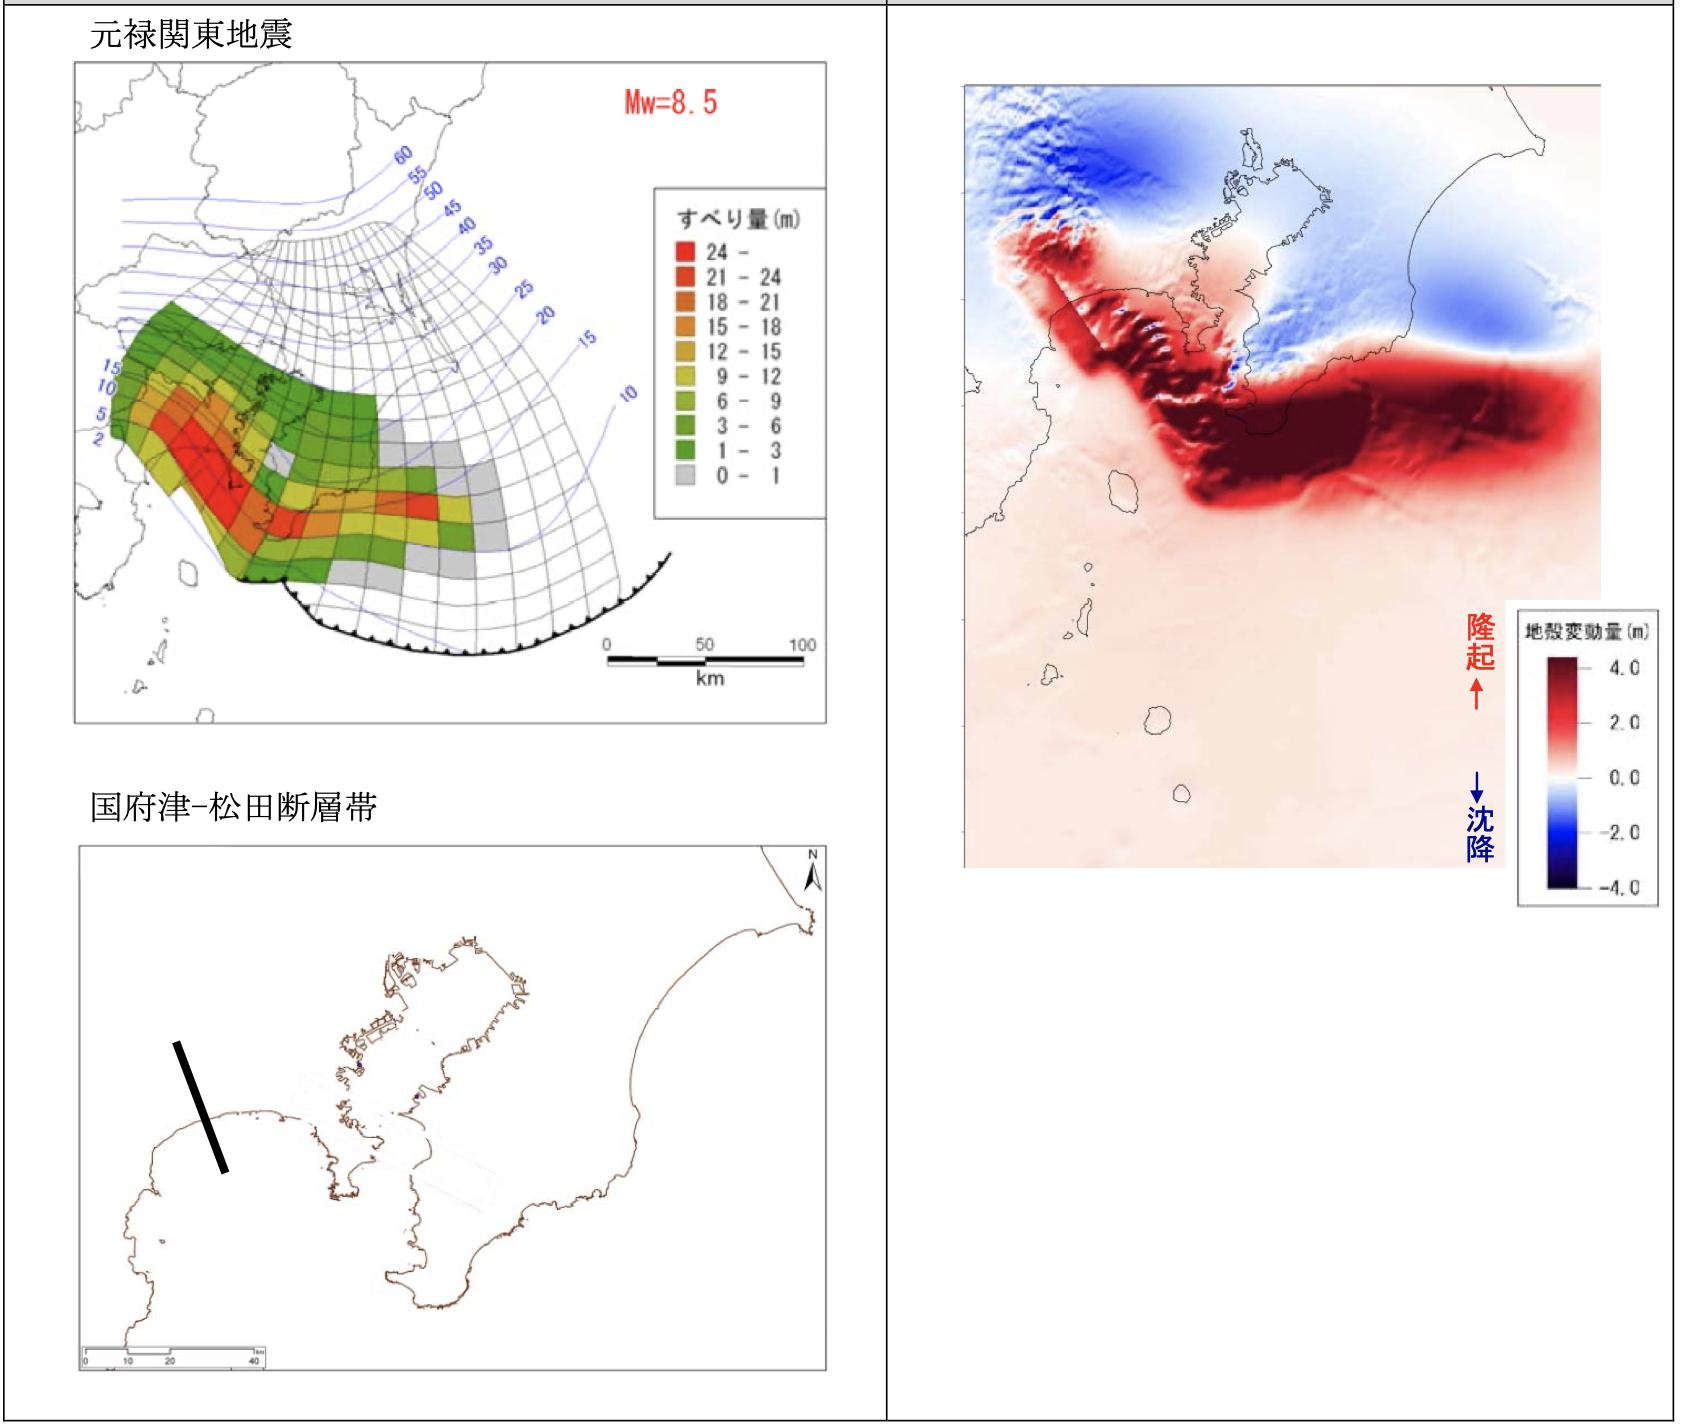 元禄関東地震タイプと国府津-松田断層帯地震の連動地震